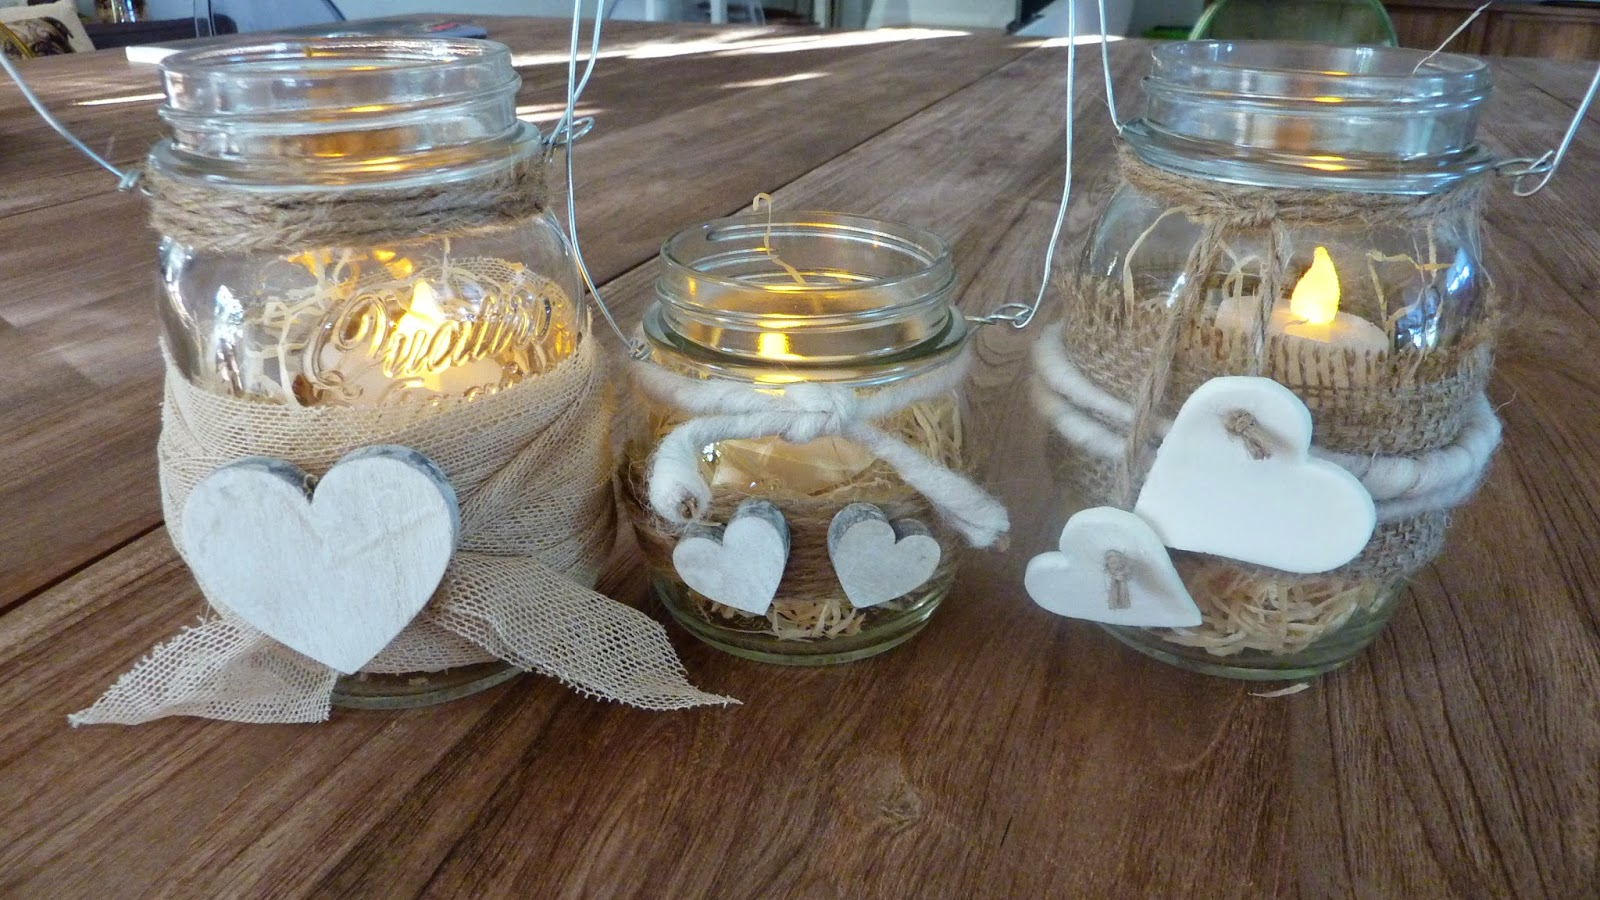 Idee Mobili Fai Da Te lanterne fai da te: 11 idee creative e originali - roba da donne